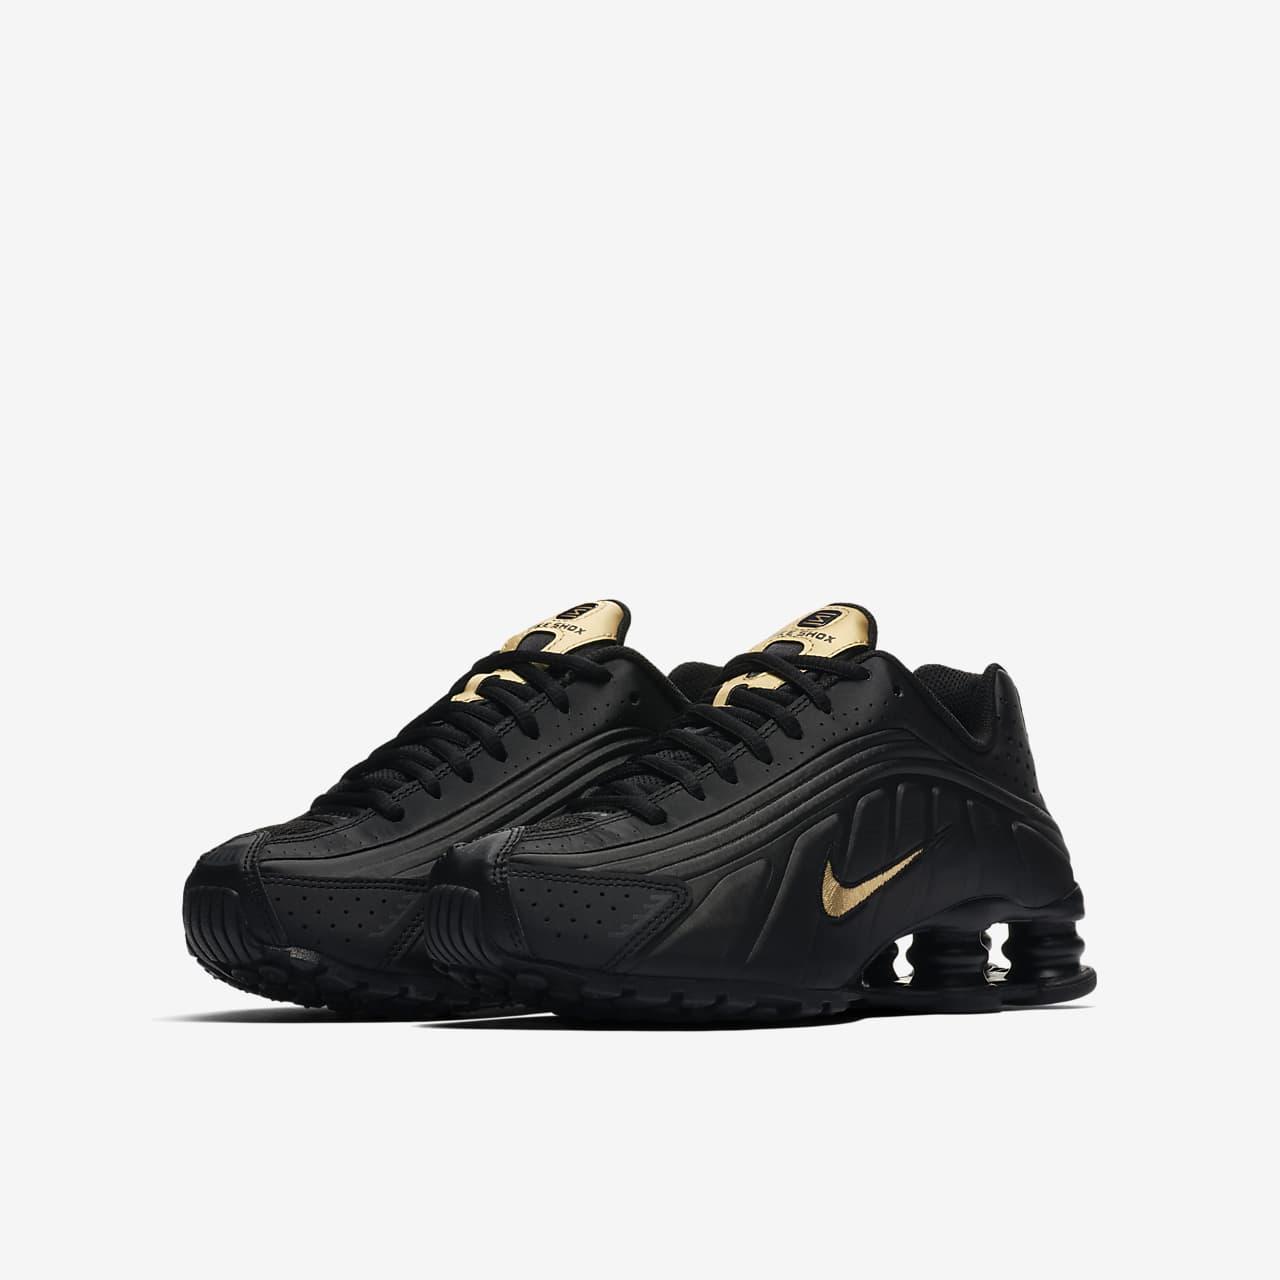 Nike Shox R4 sko til store børn. Nike DK